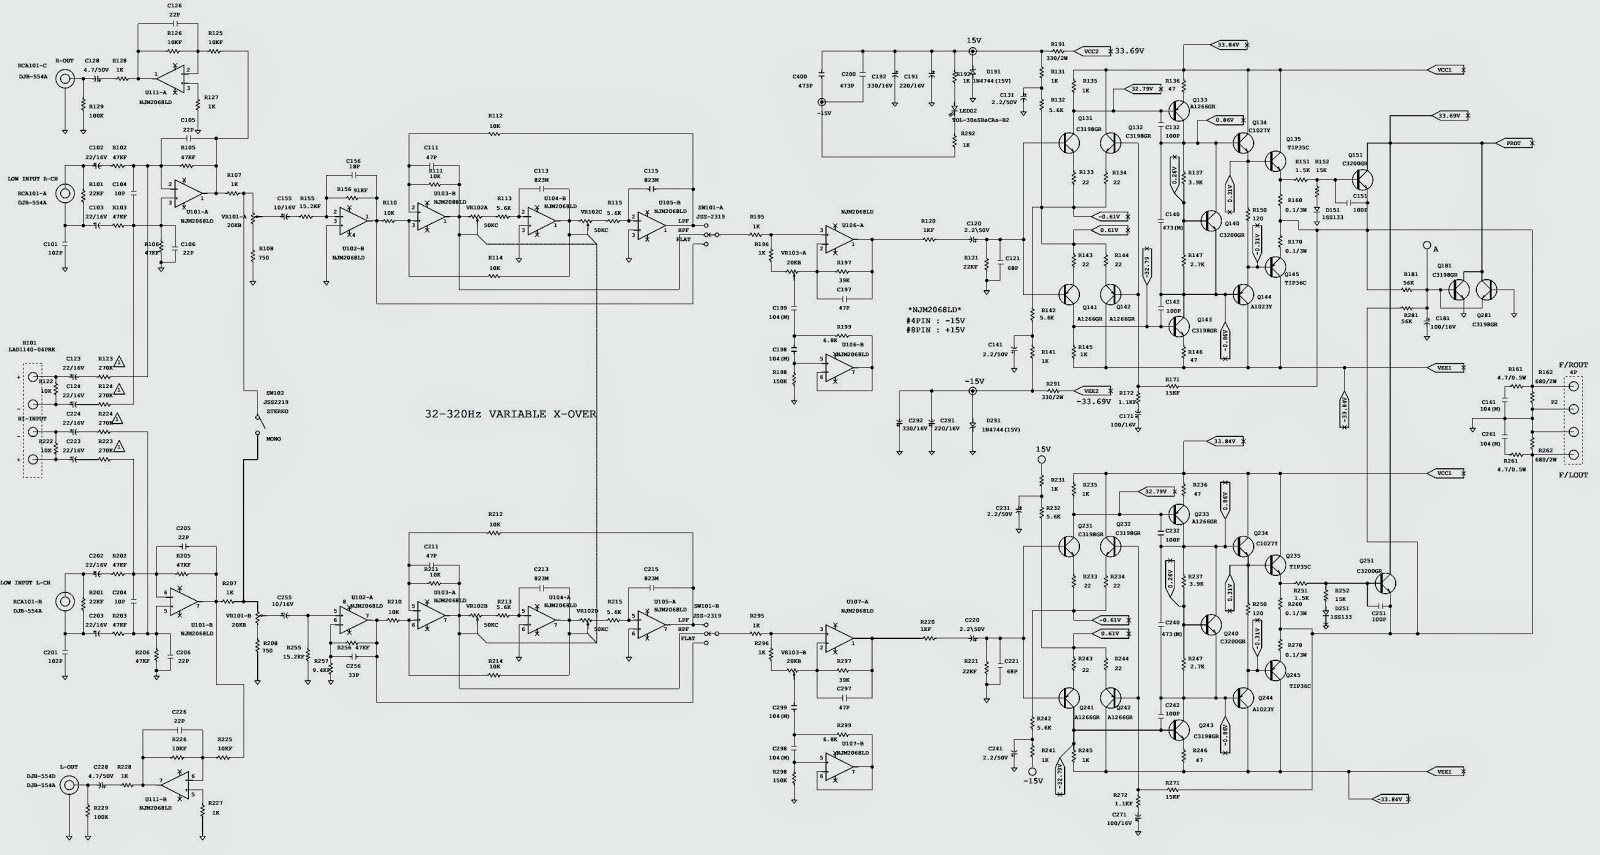 lc6i wiring diagram wiring diagram 2010 e 150